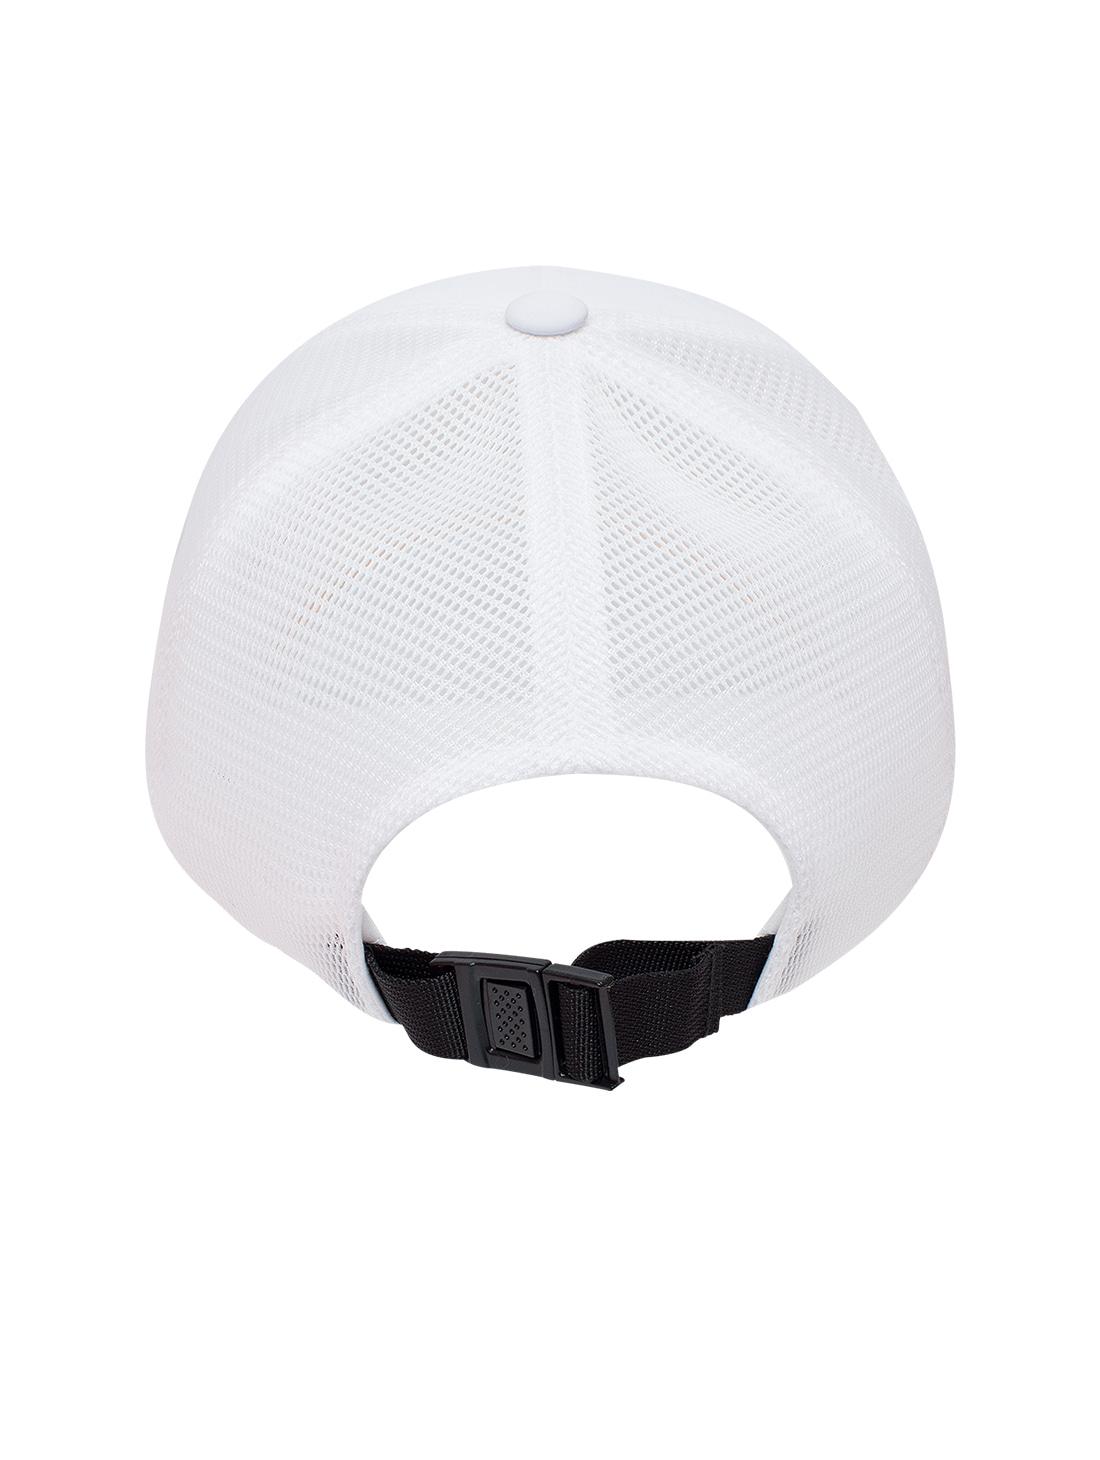 MC TRUCKER CAP - WHITE